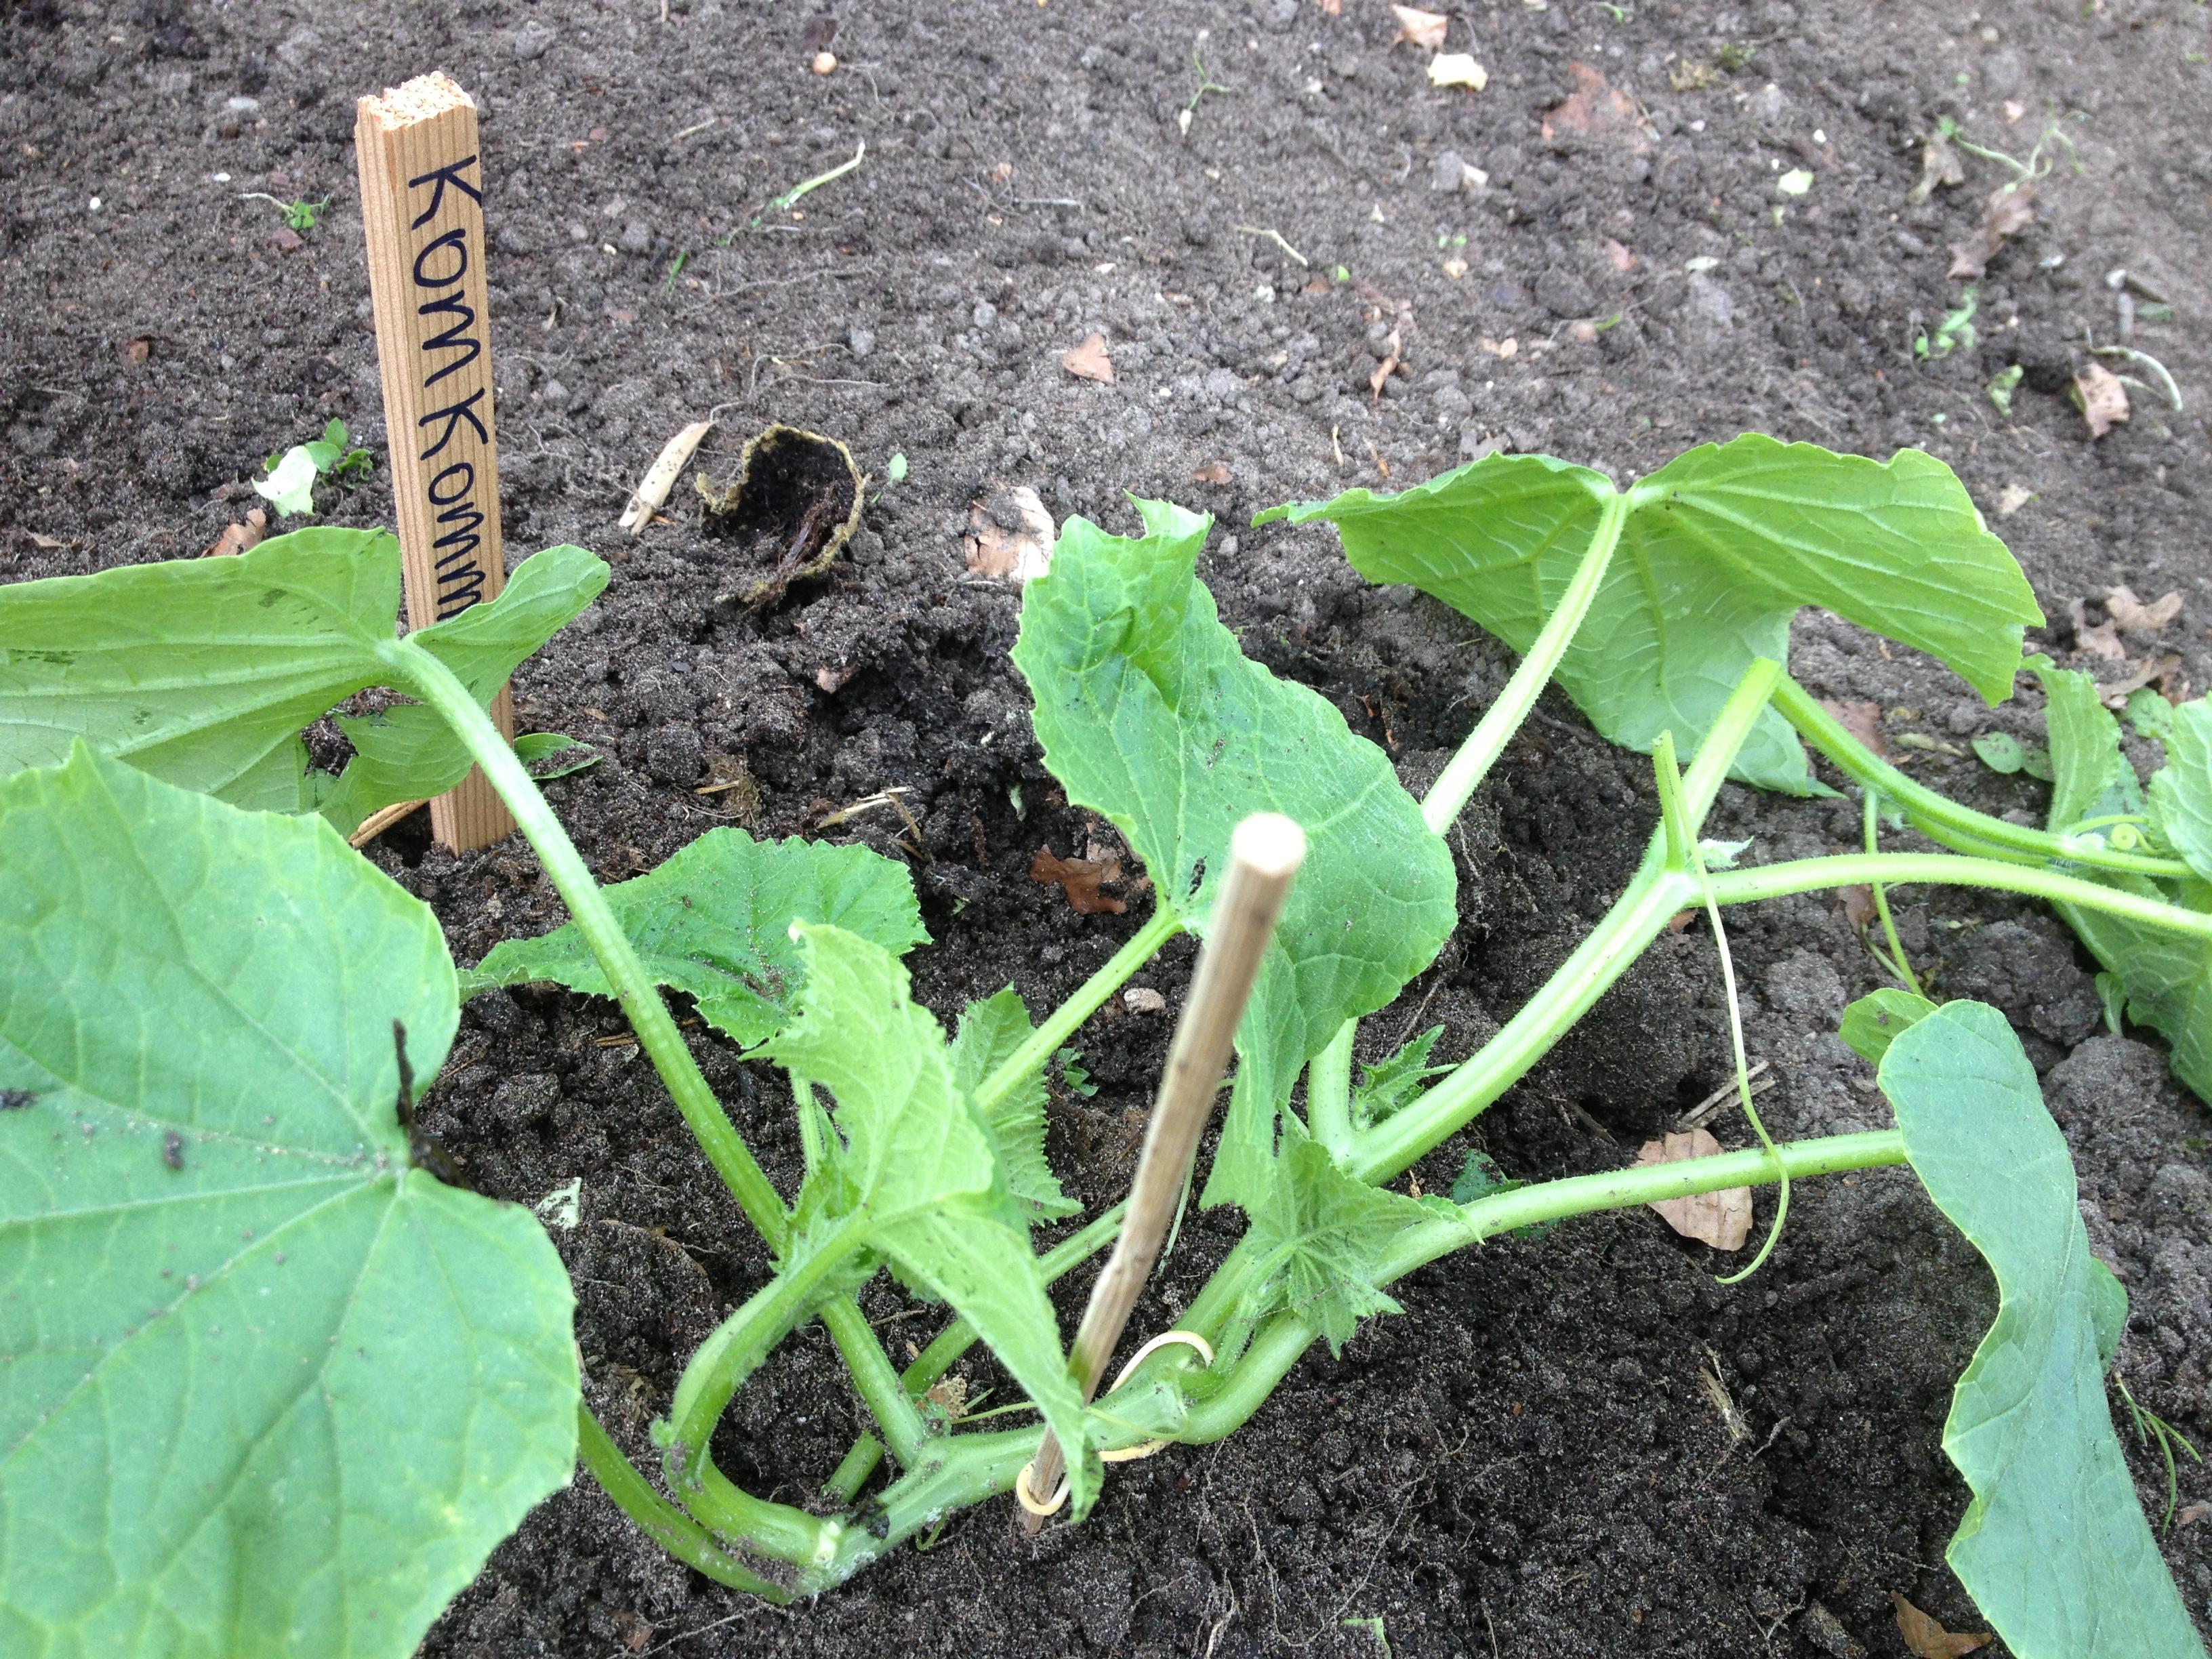 Ik wil komkommers kweken moestuin beginnenmoestuin beginnen - De komkommers ...